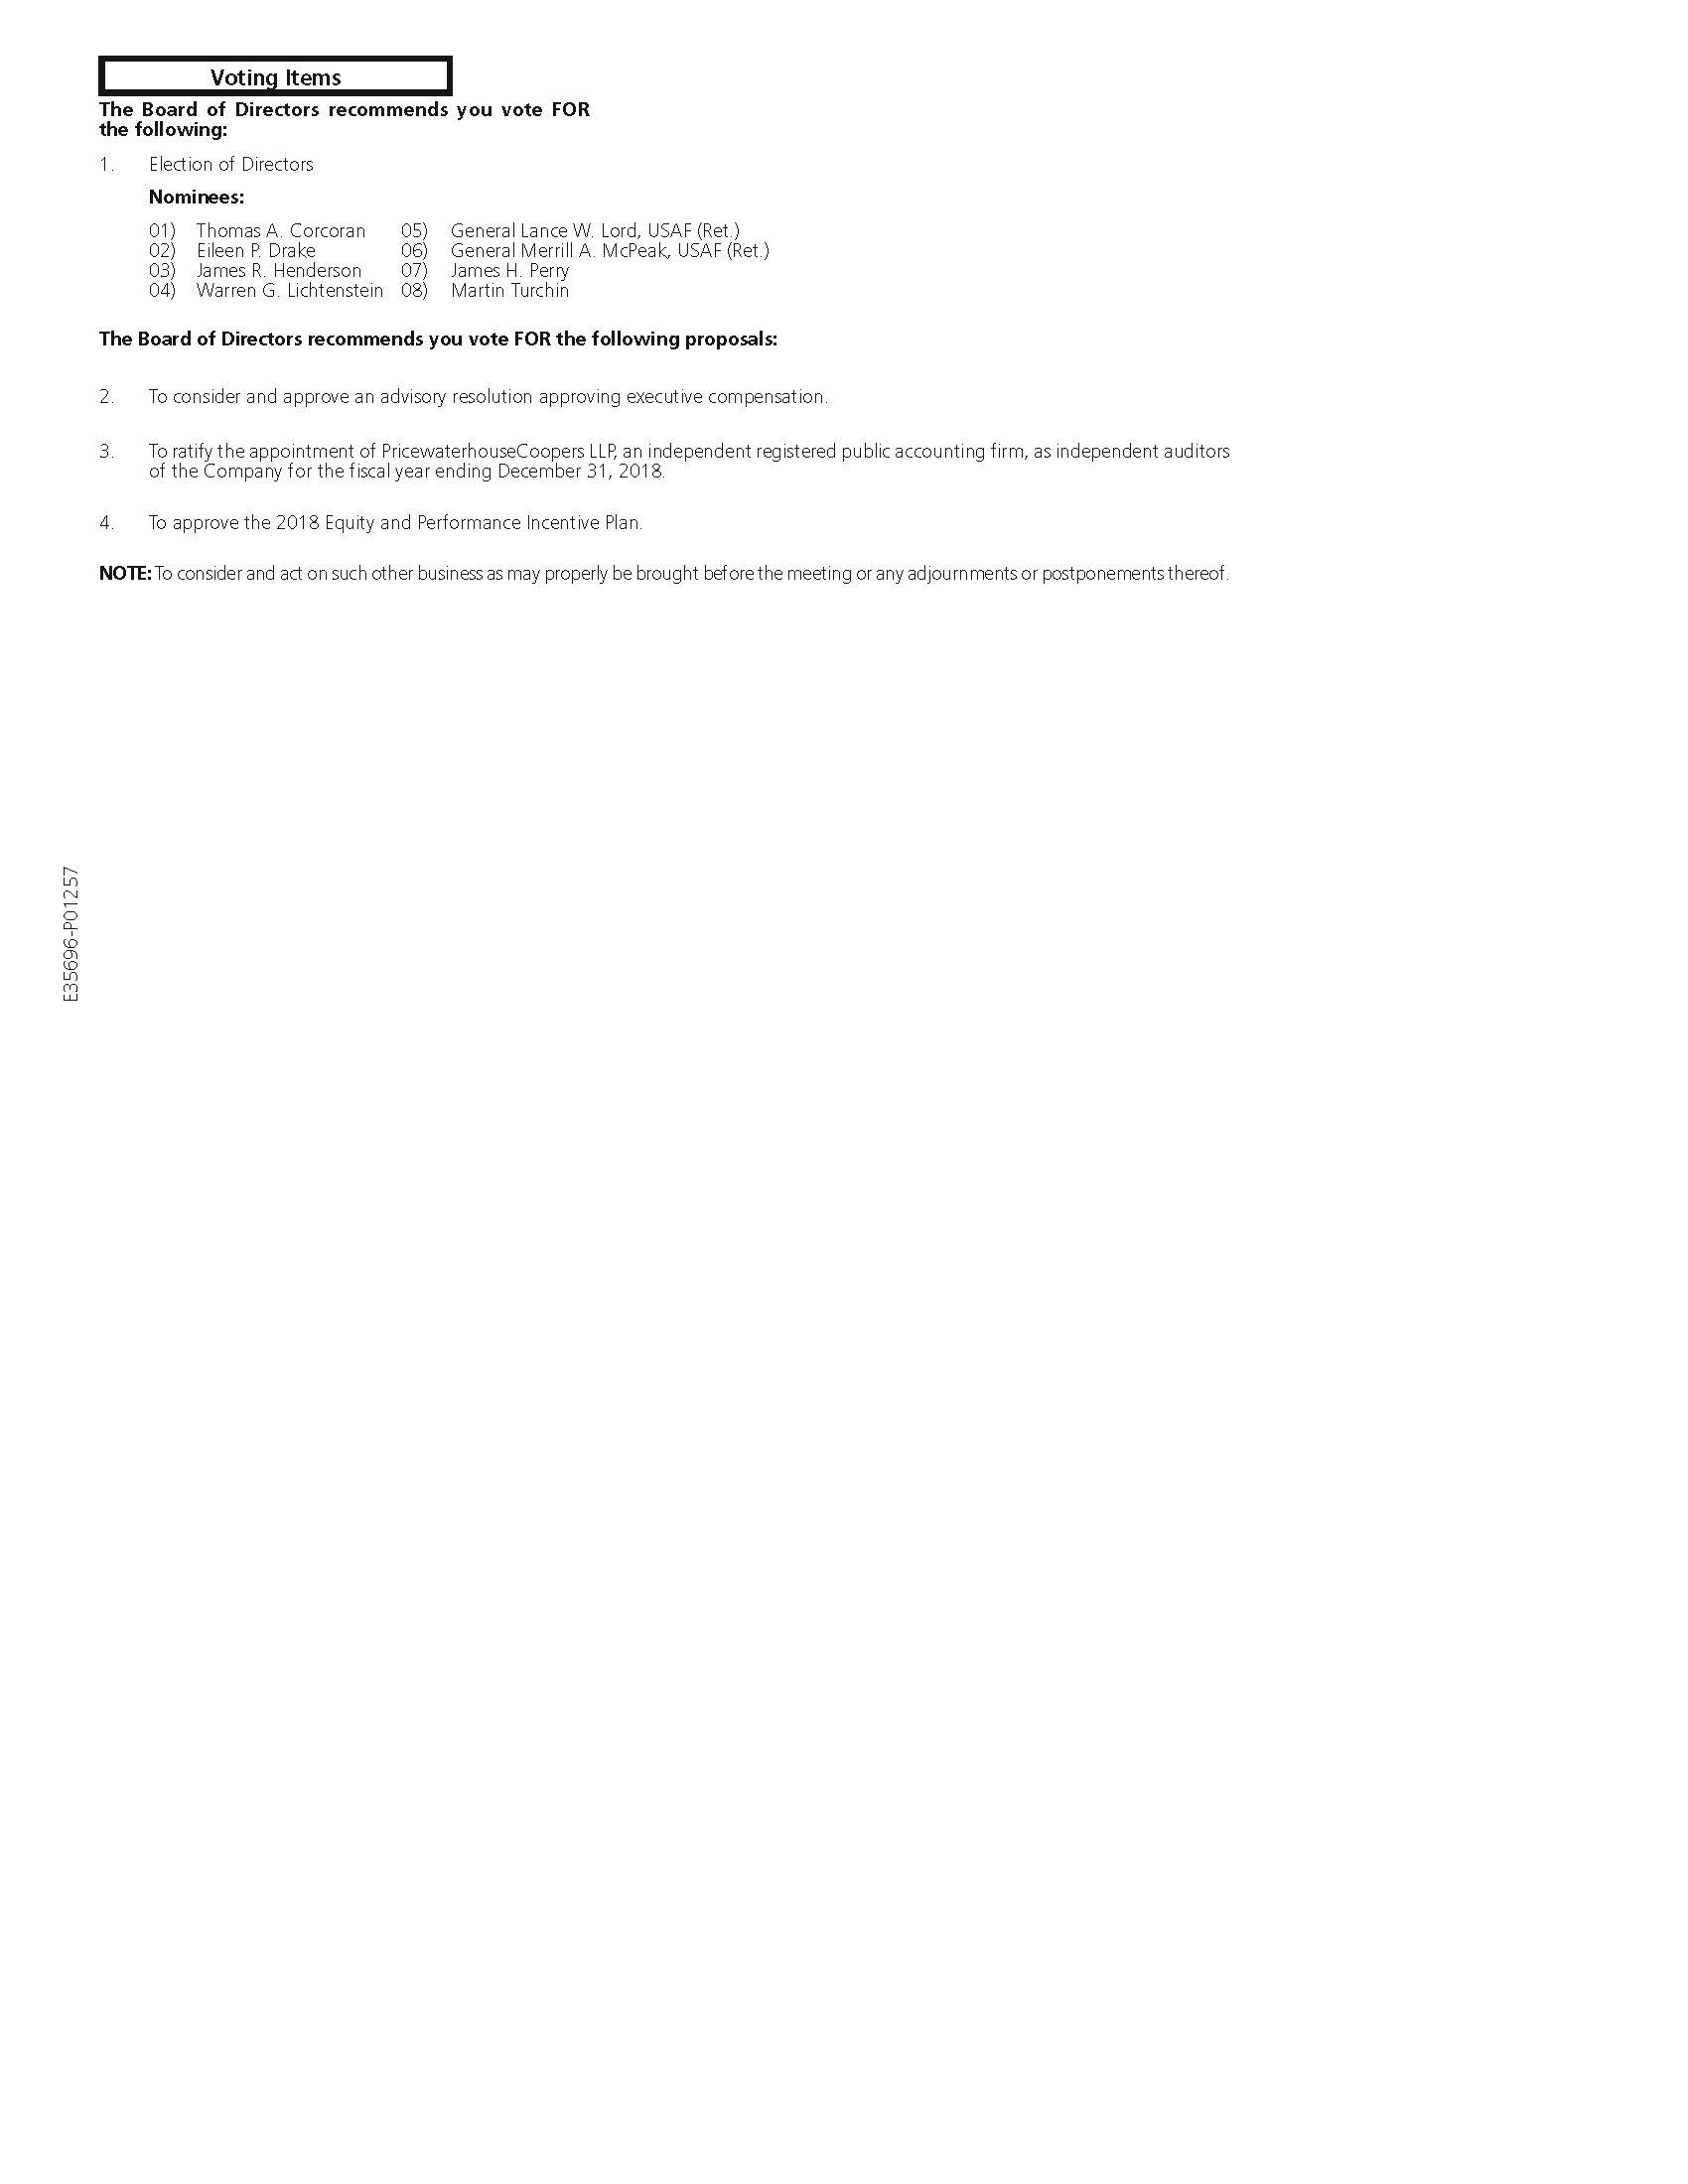 BROADRIDGENOTICECAR22018339C.JPG